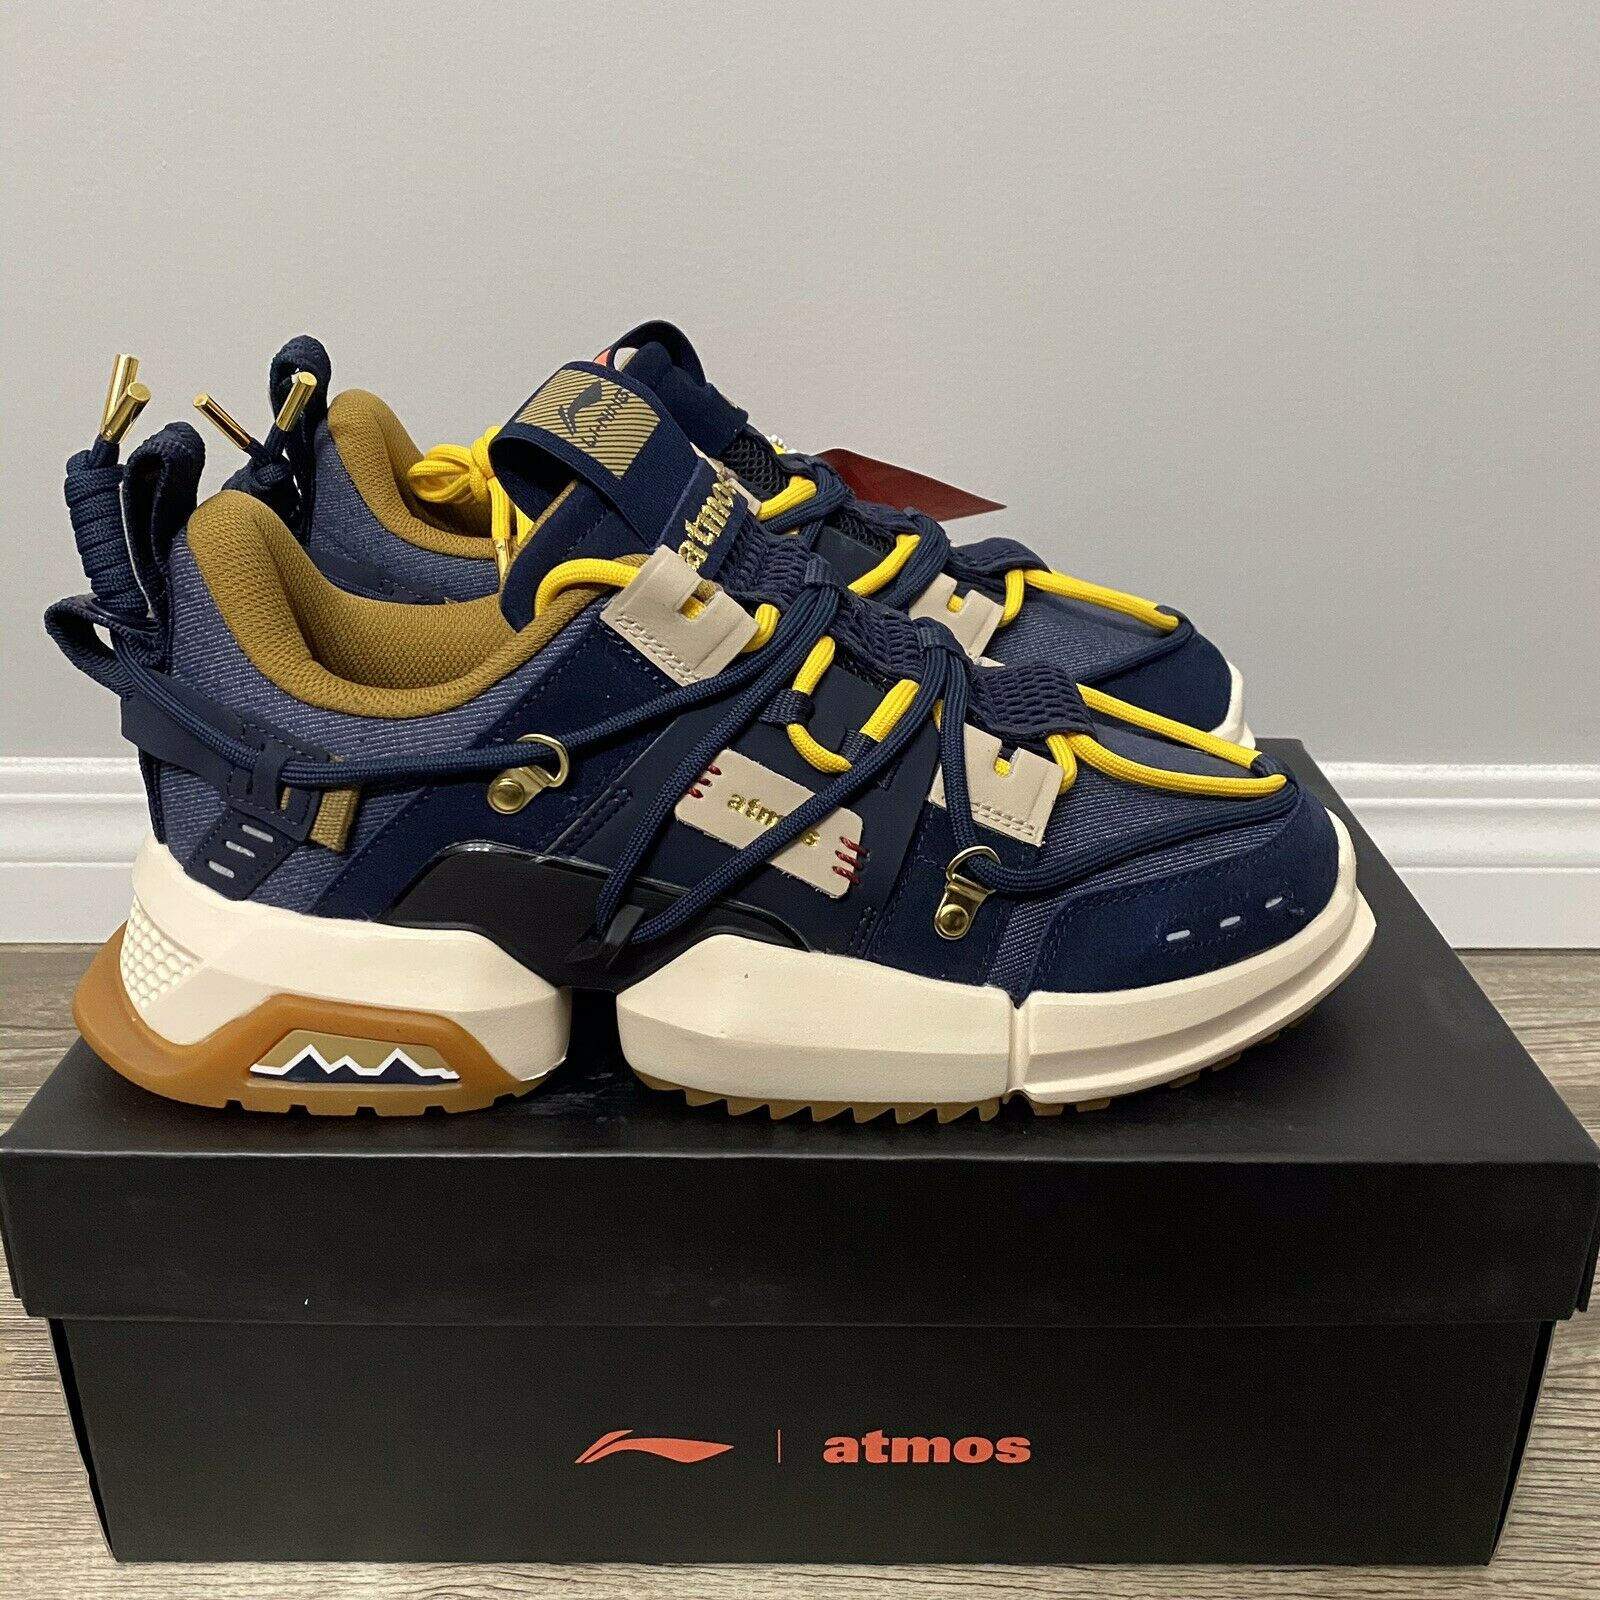 Li-Ning x Atmos Titan US10 DS Japan exclusive Lining Sneaker Shoes